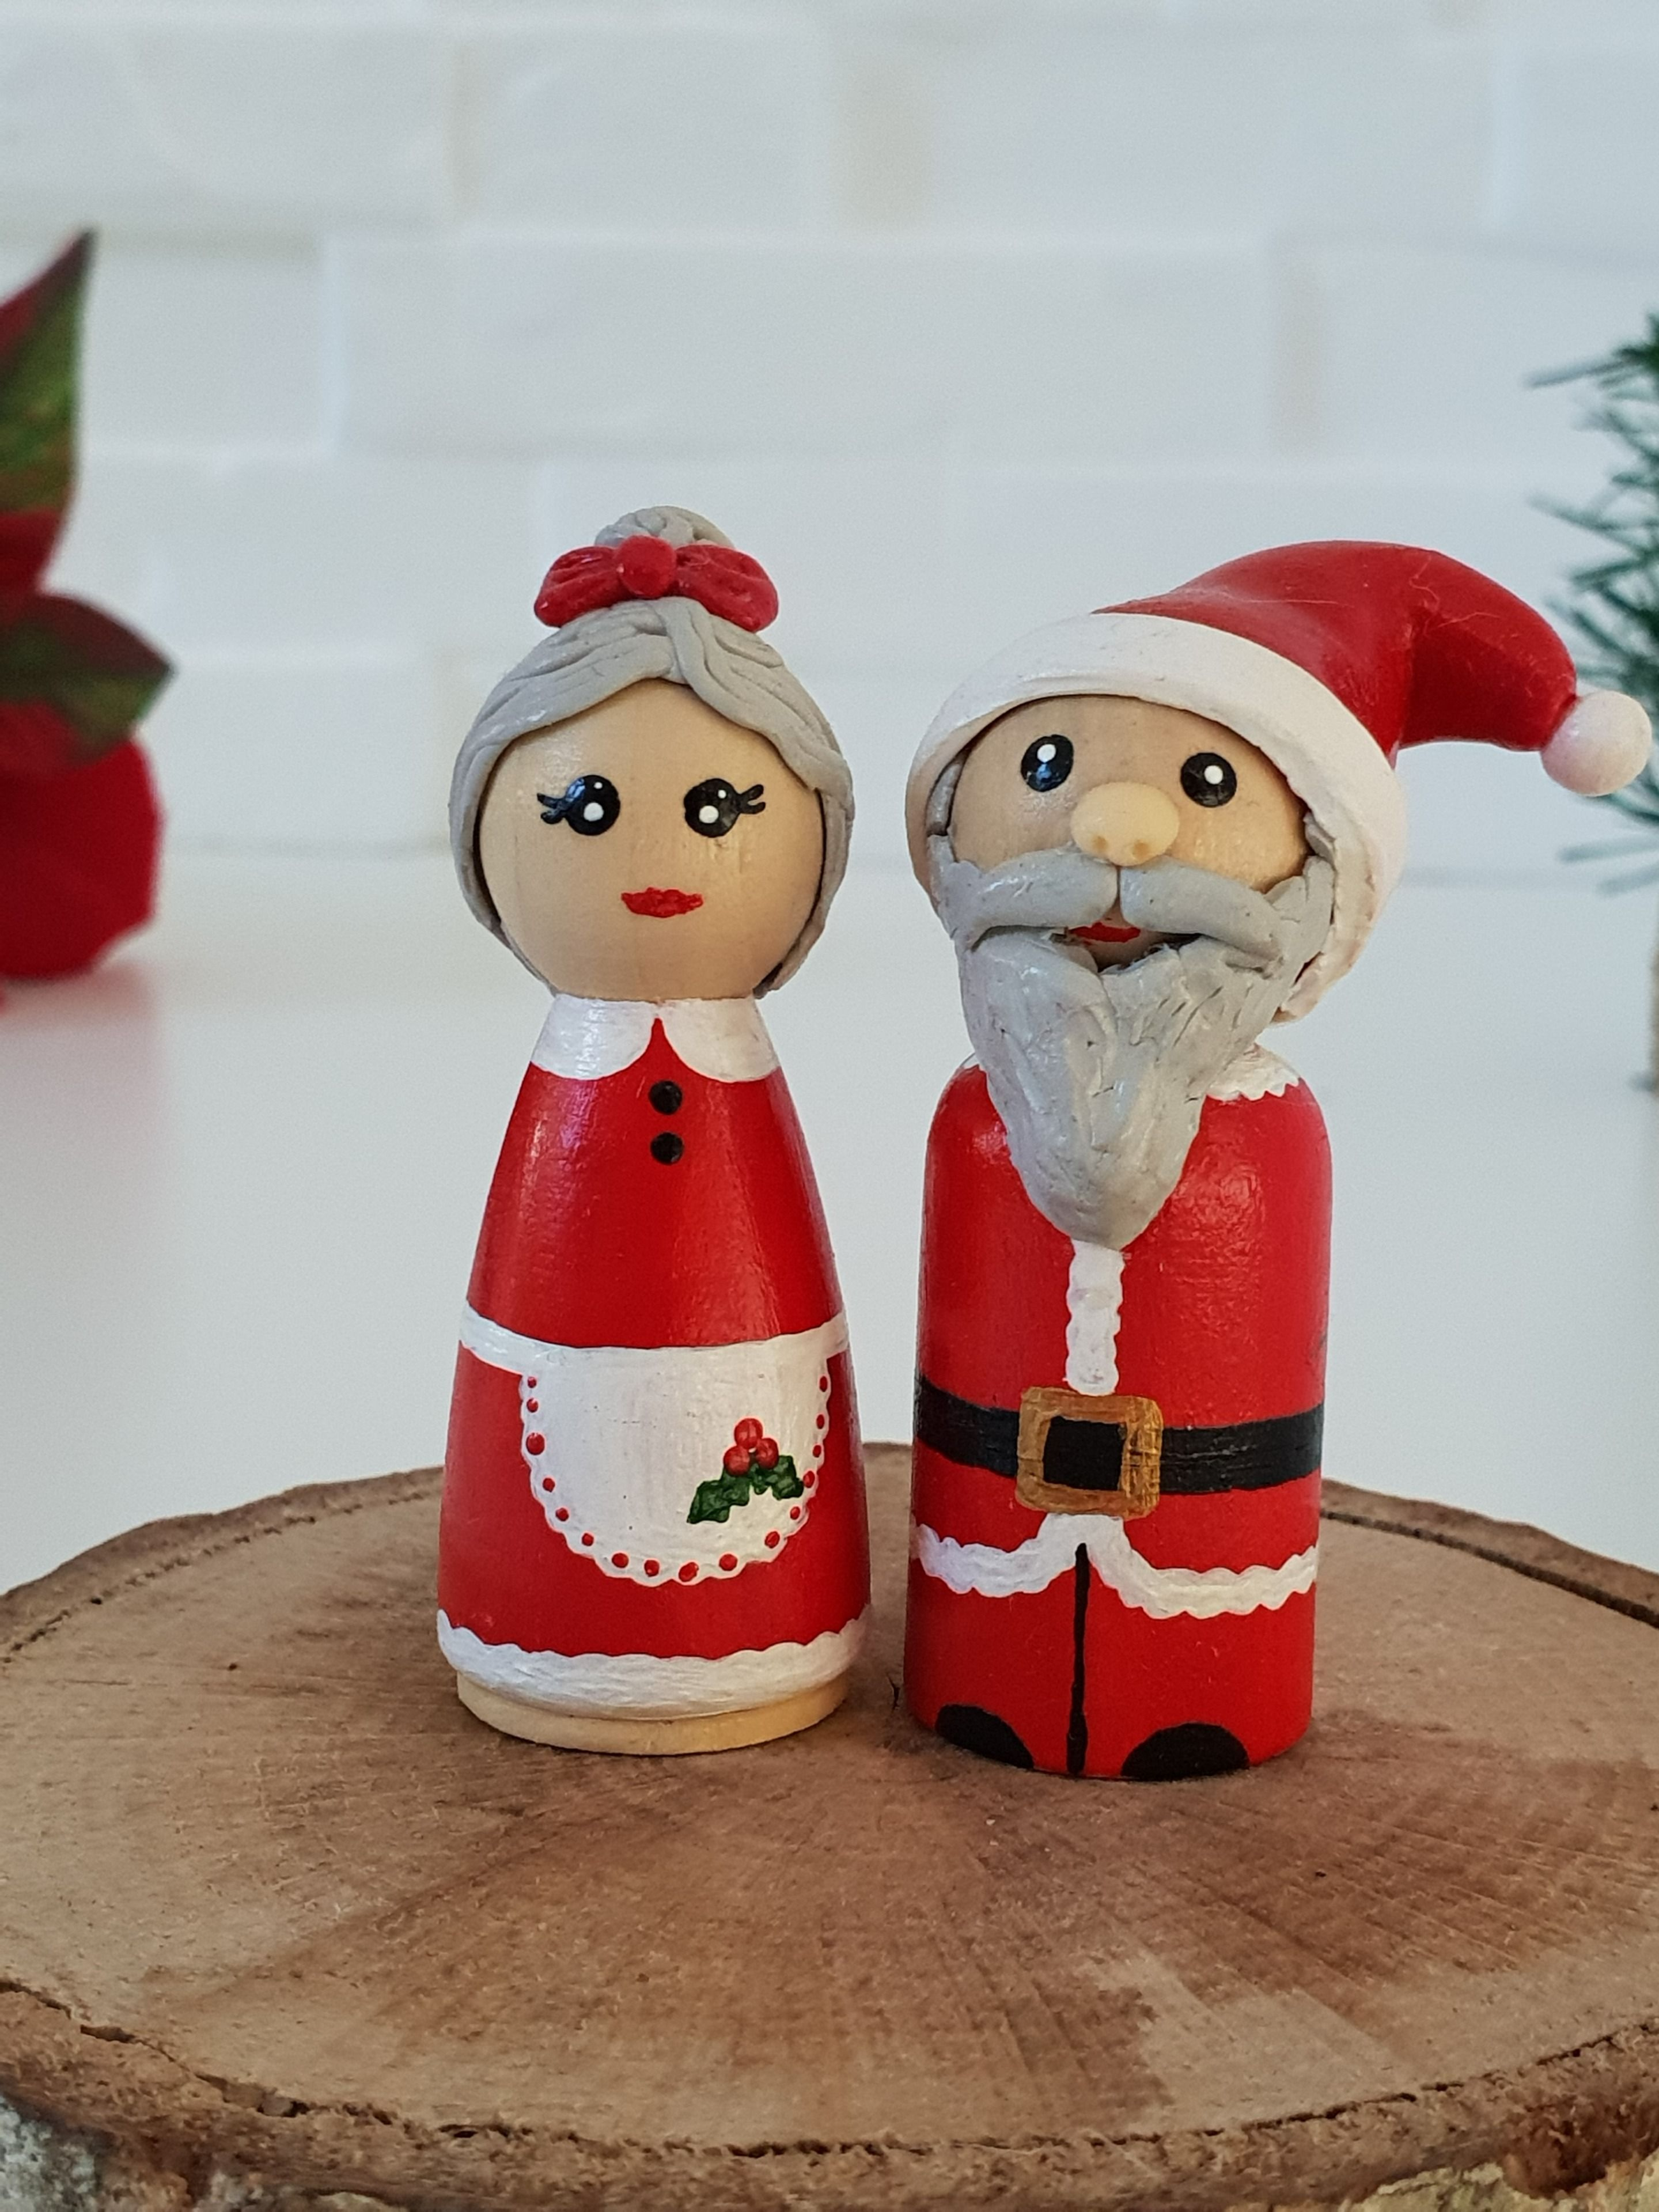 Christmas Ornaments Toys Stocking Stuffers Santa Clause Snowman Elf